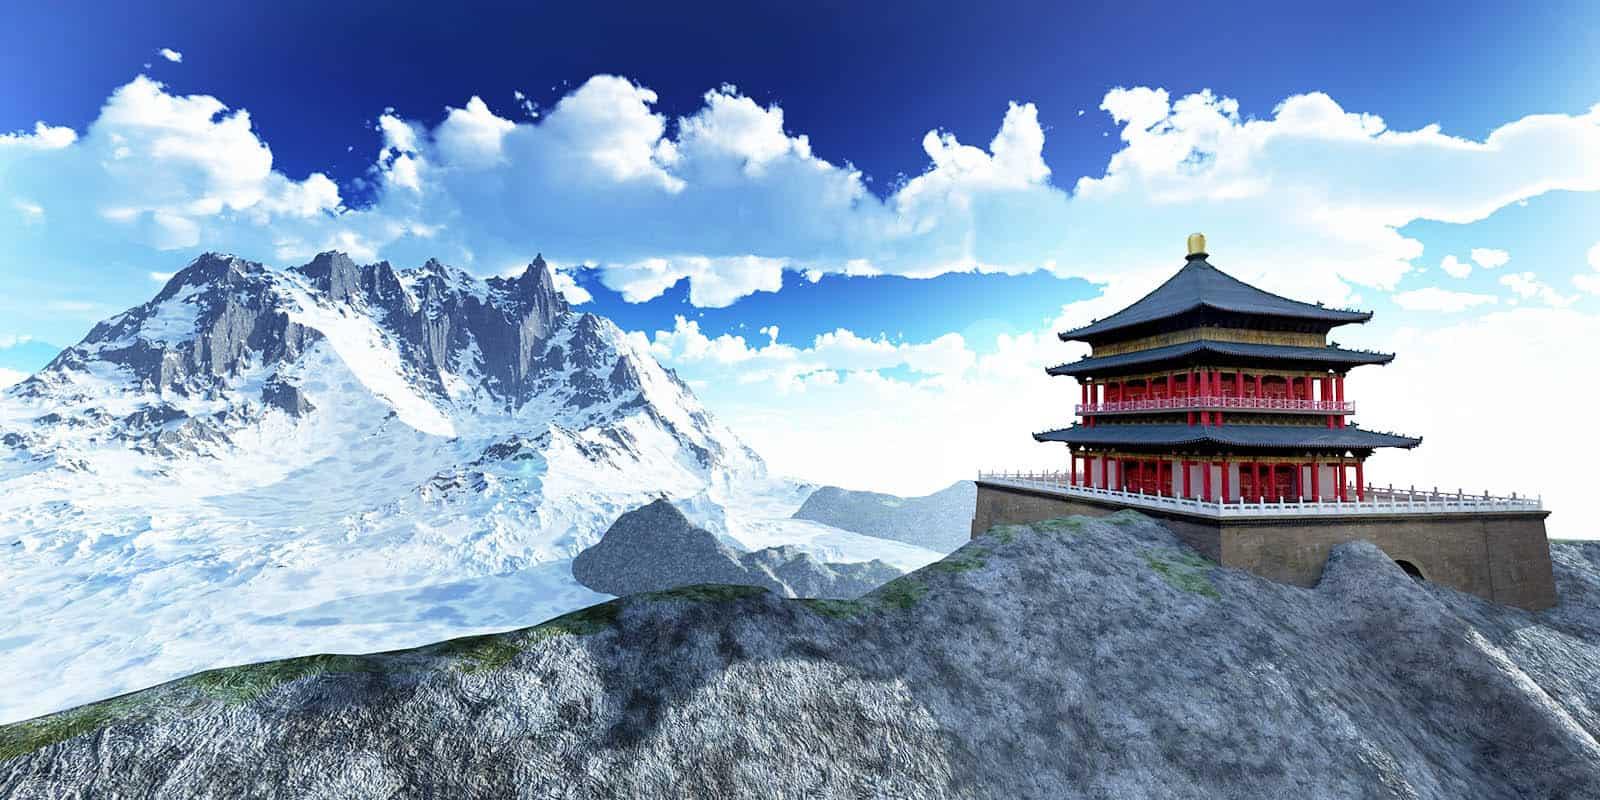 The Last Shangri La of Bhutan